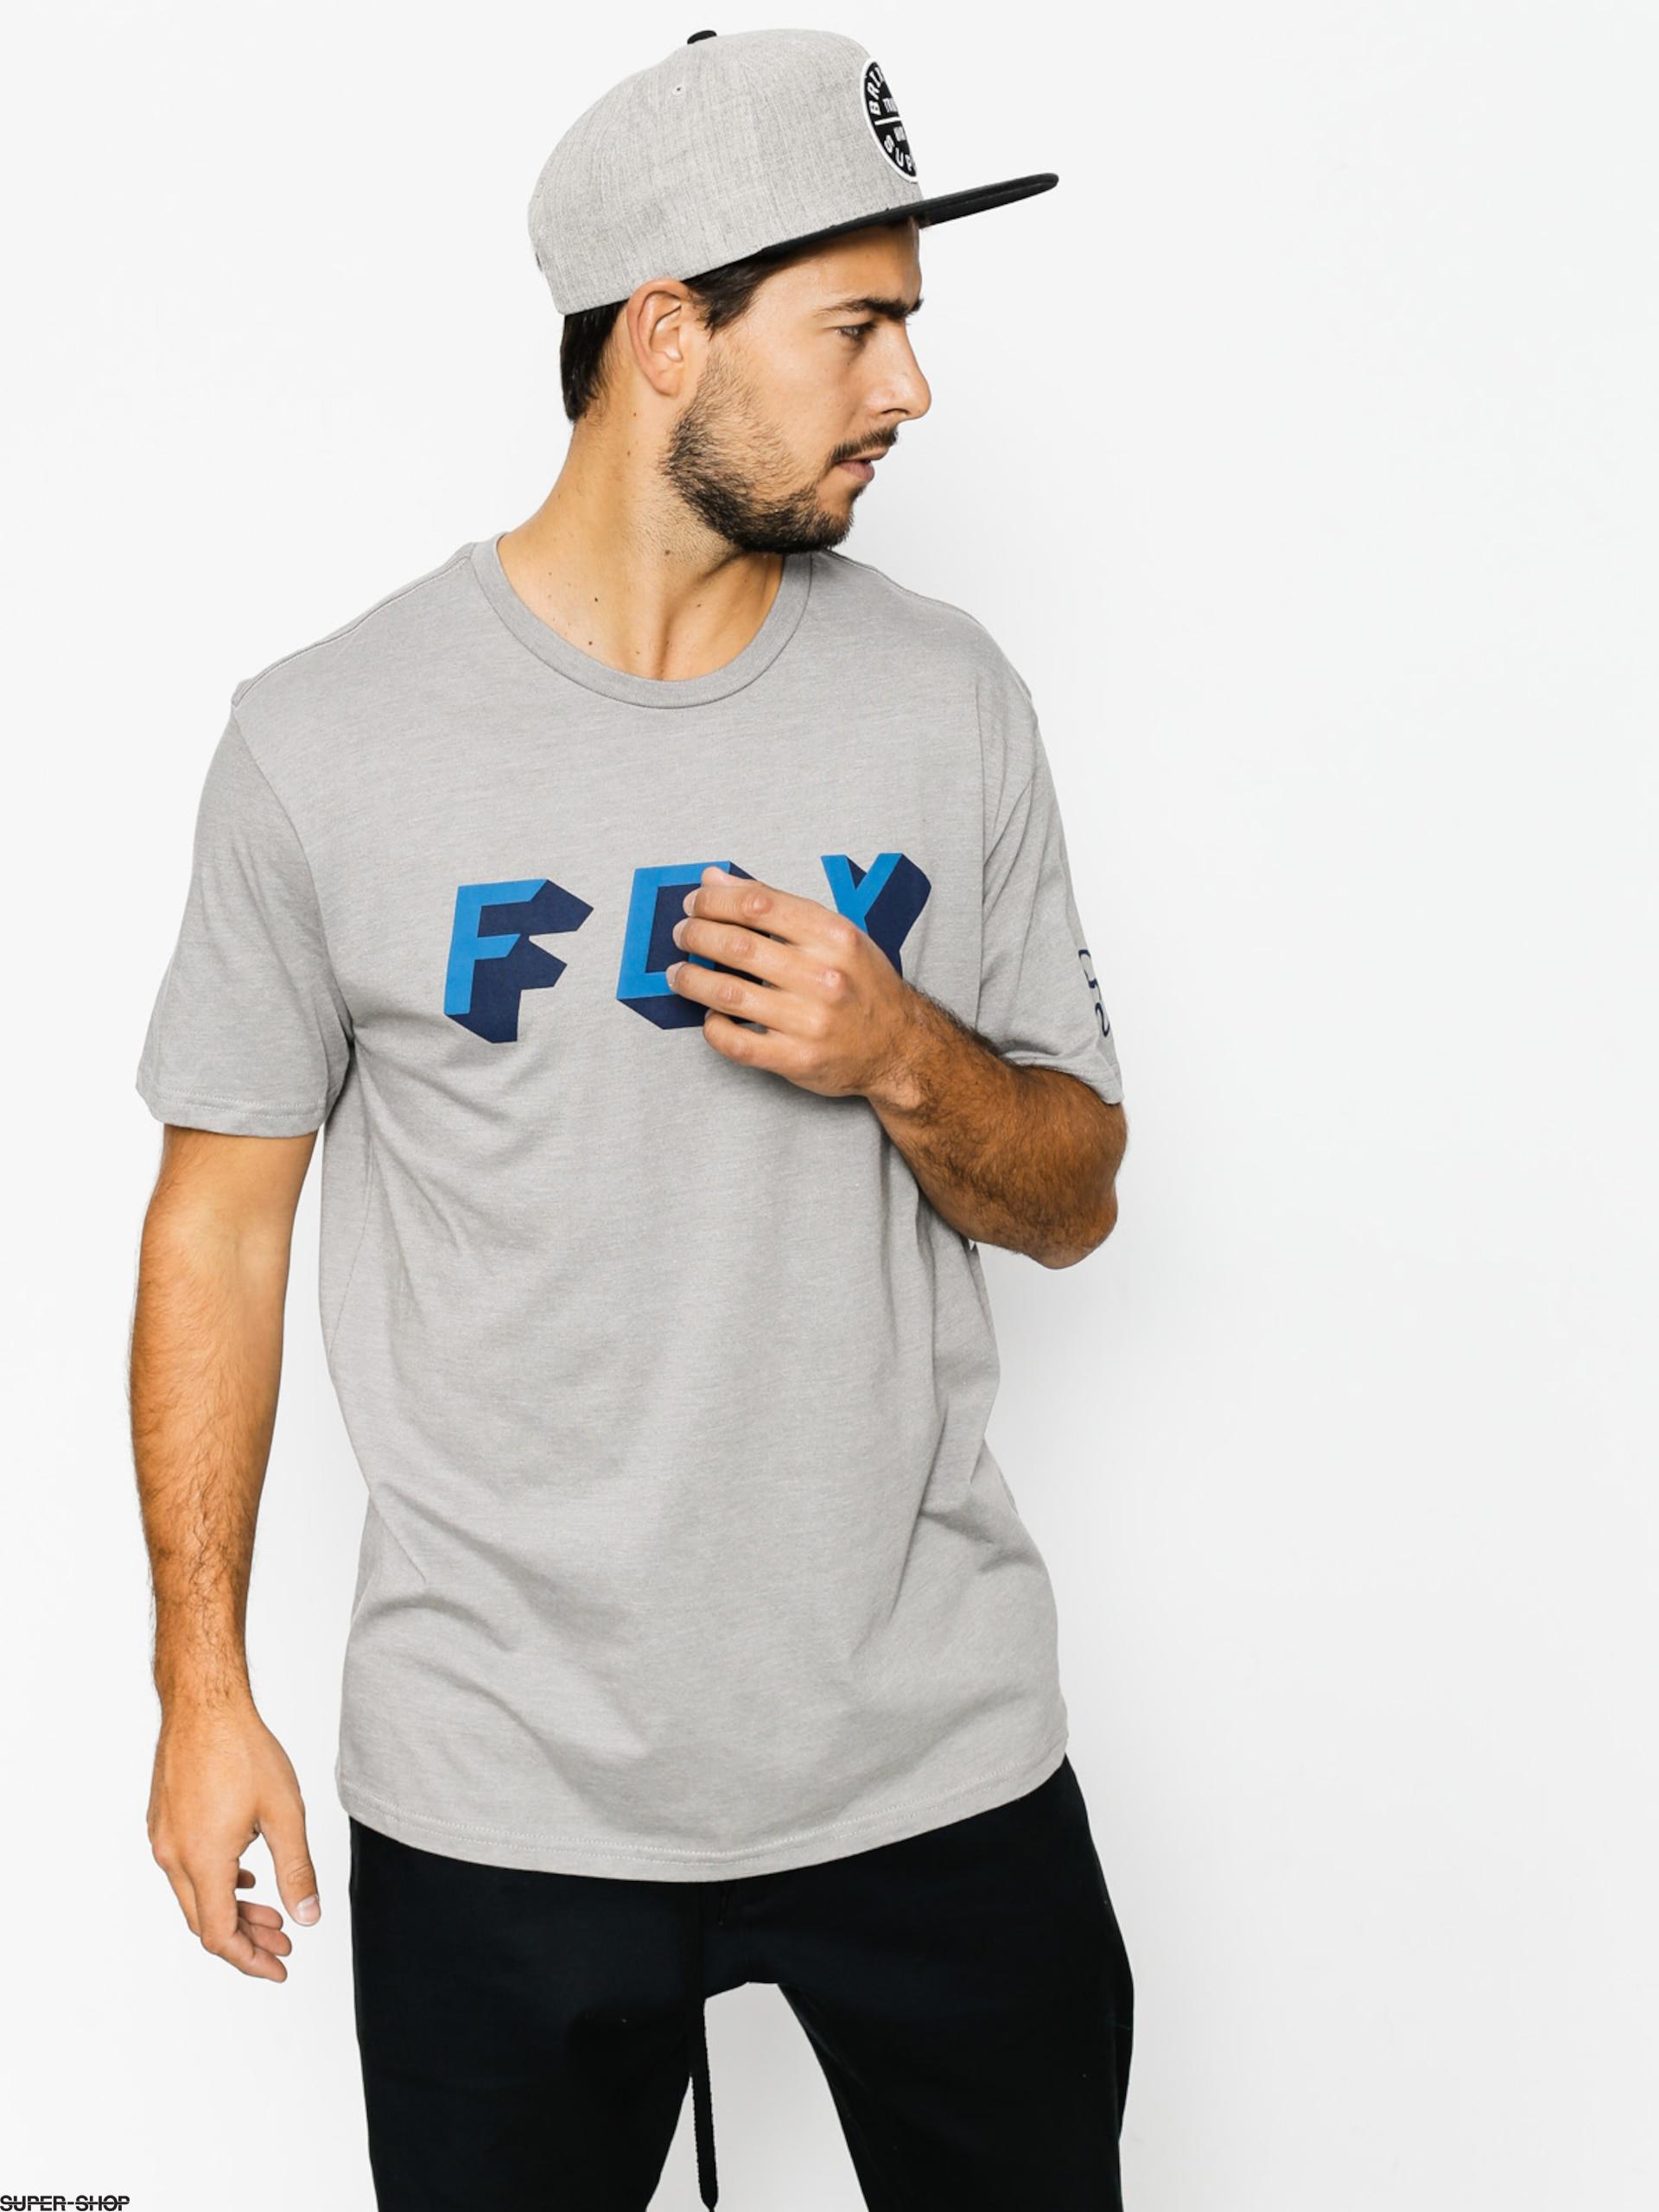 New Fox Men's Barred Short Sleeve Premium Tee